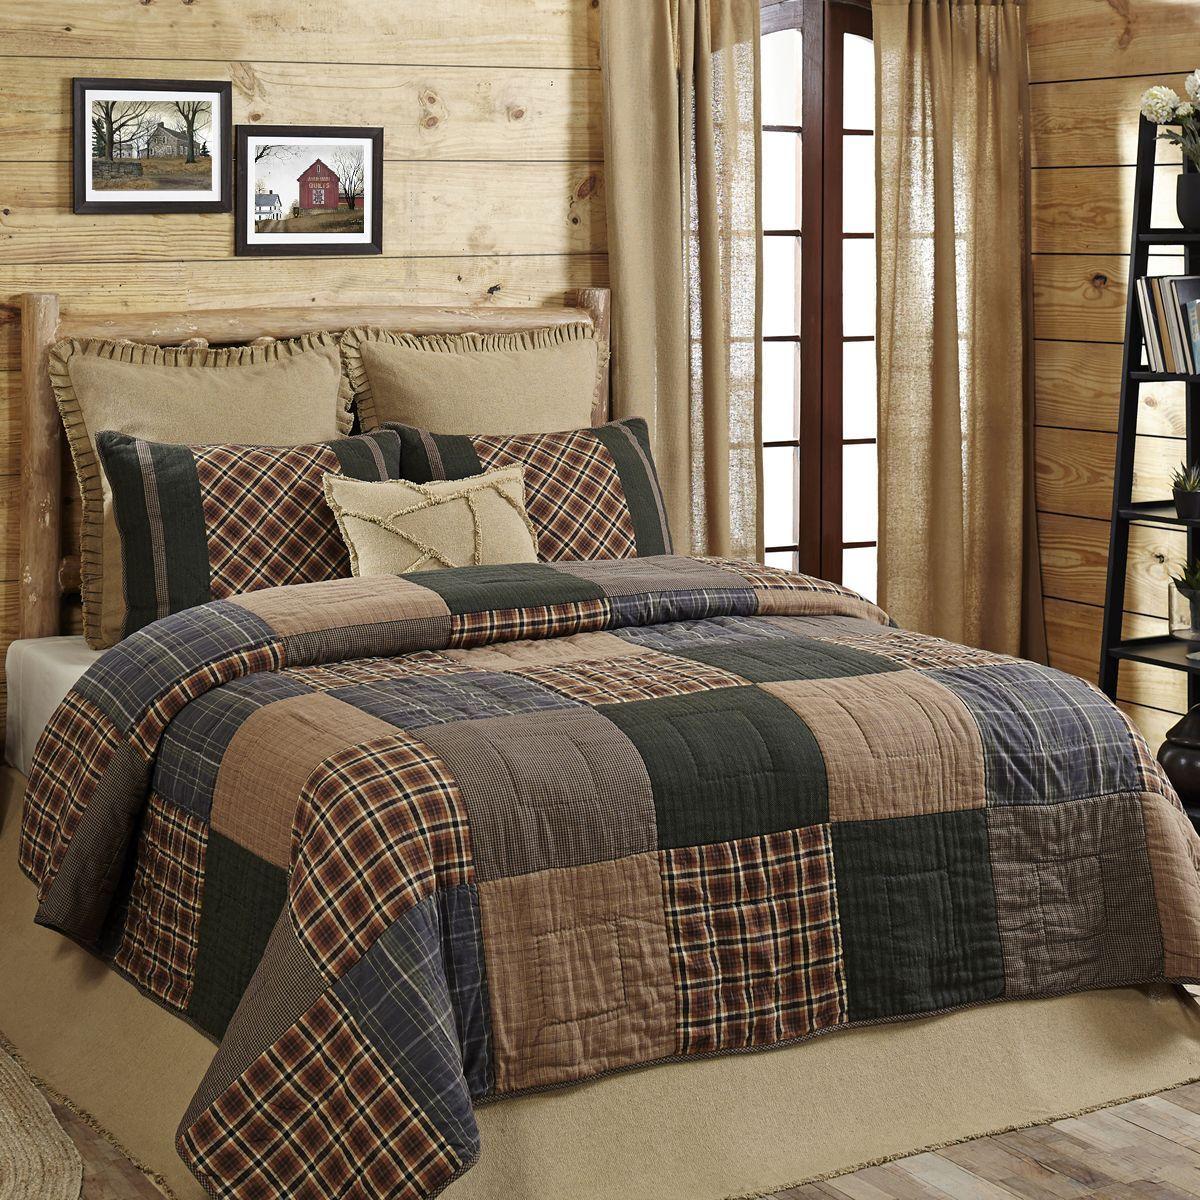 Henley king 3pc quilt set rusti c primitive plaid brown blue creme bedding set in home gardenbeddingquilts bedspreads coverlets ebay